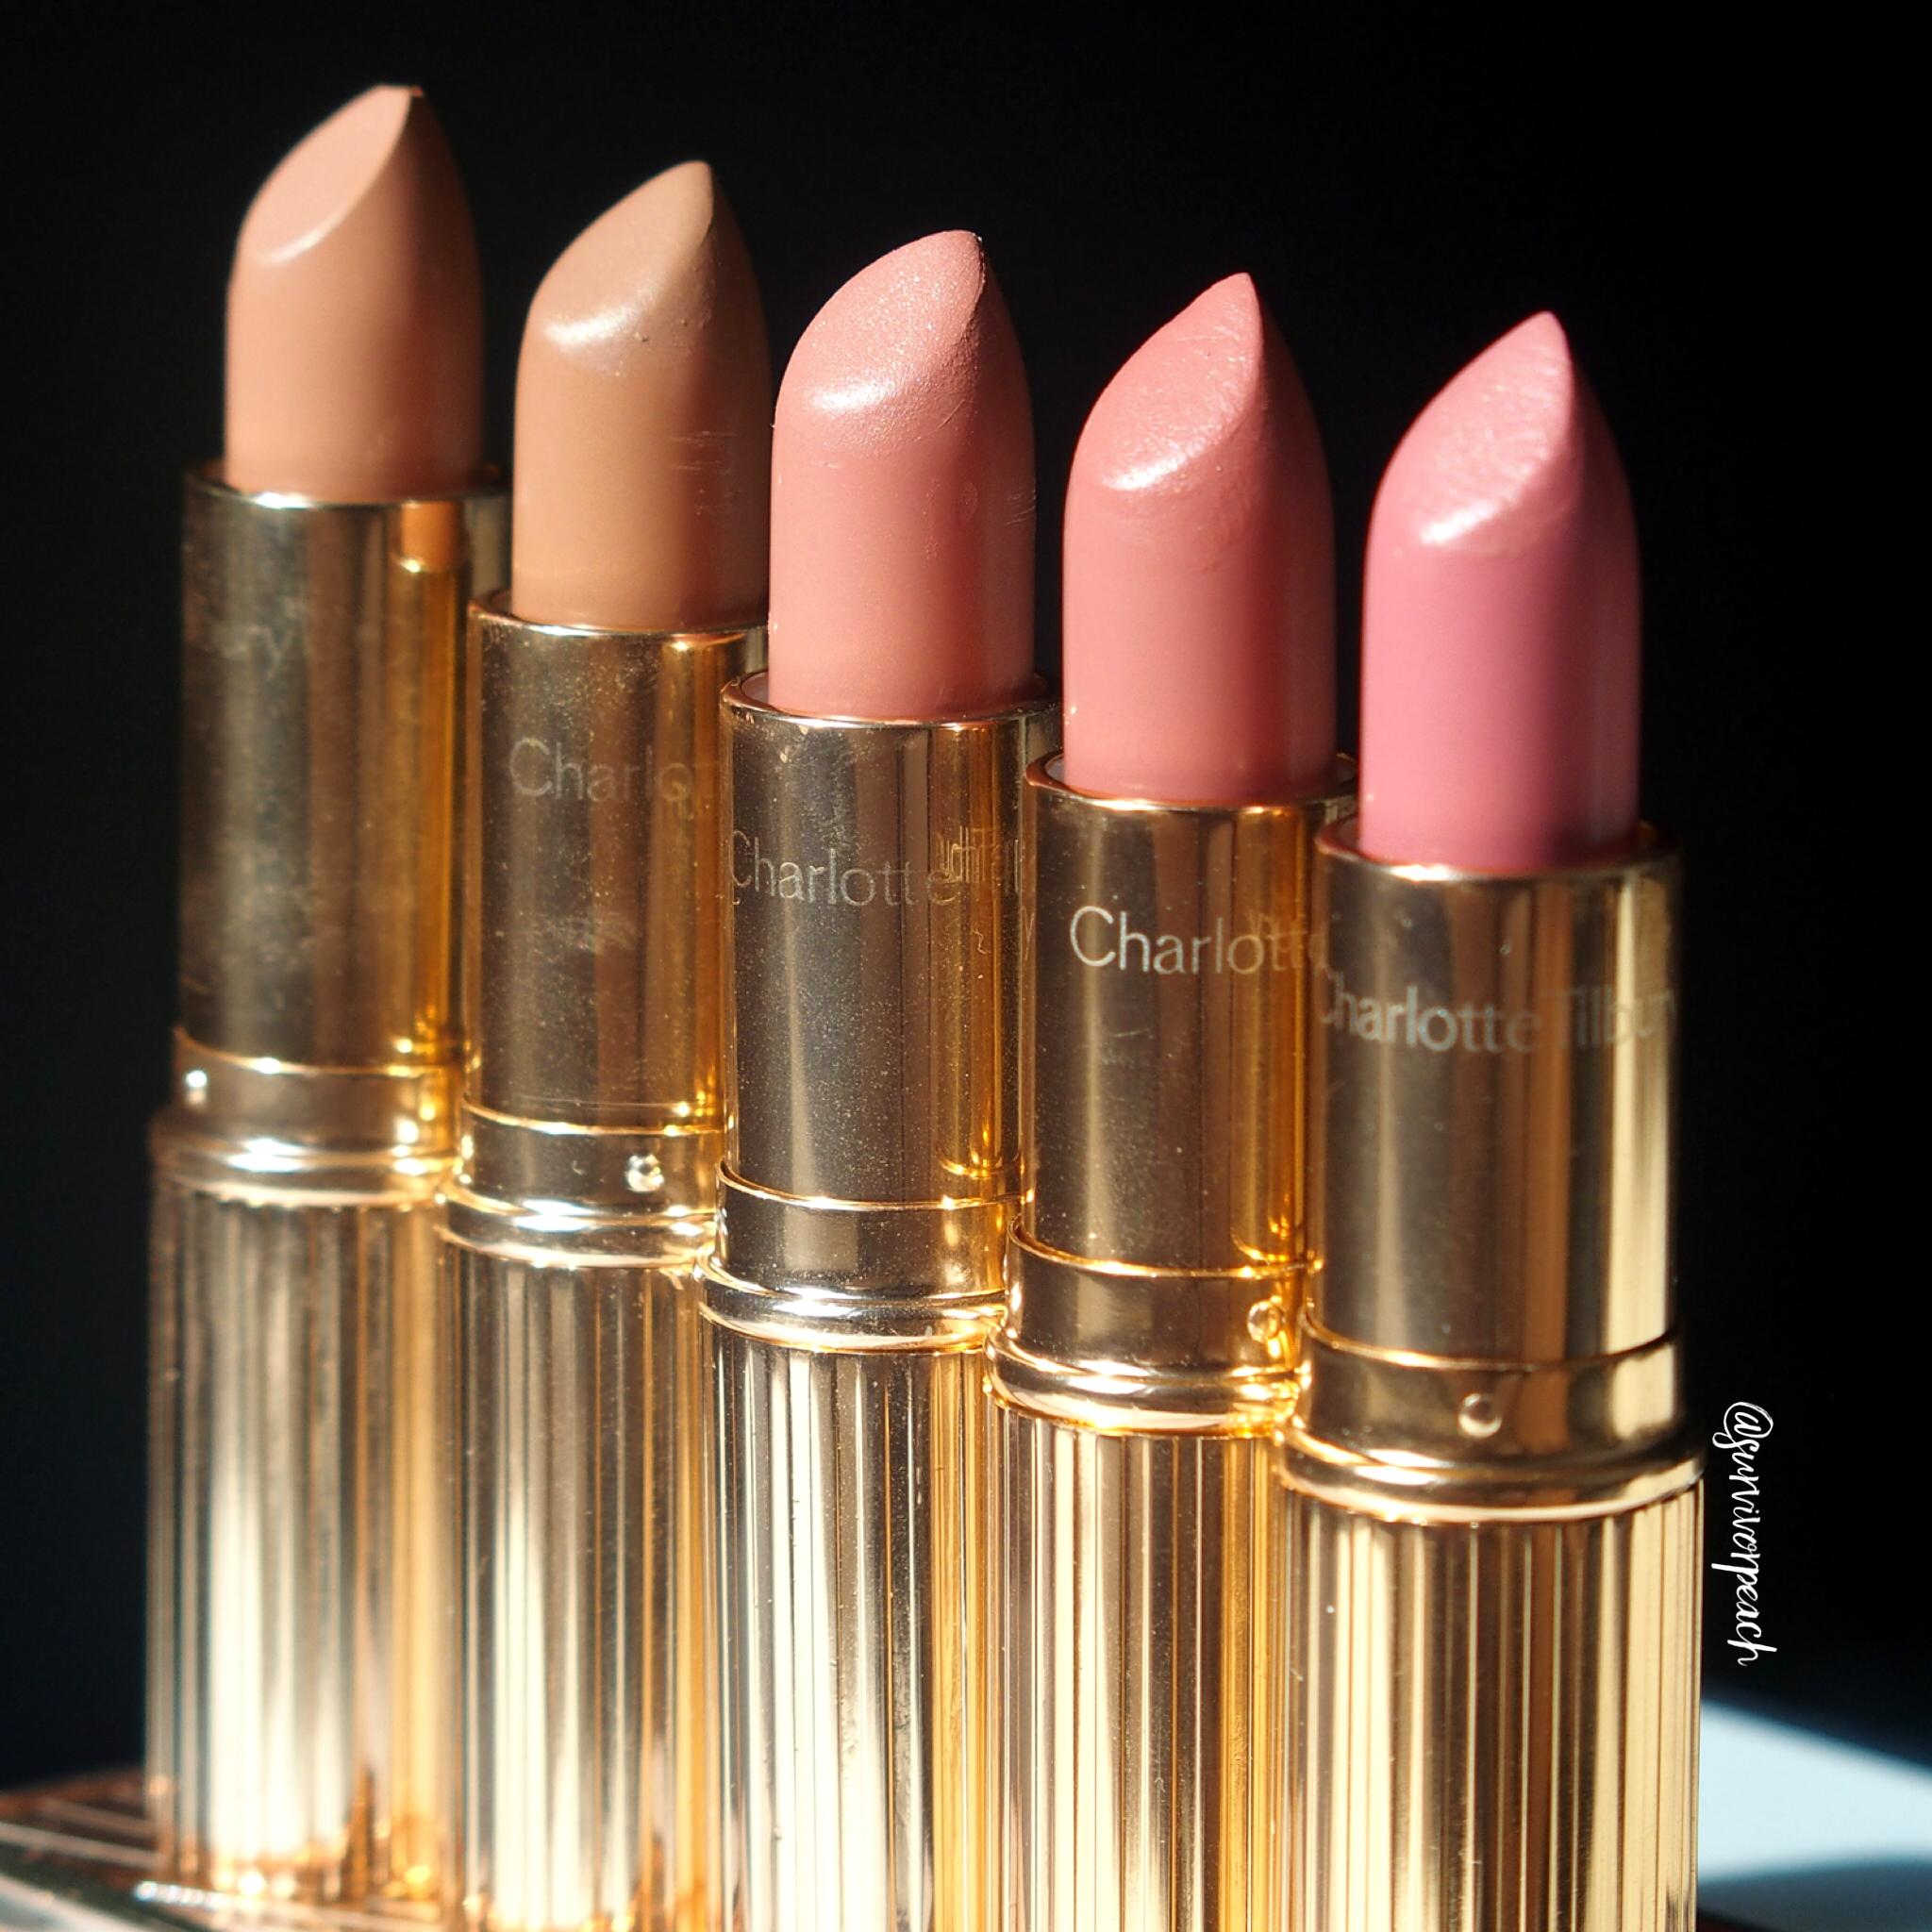 Charlotte Tilbury K.I.S.S.I.N.G Lipsticks in shades Penelope Pink, Hepburn Honey, Bitch Perfect, American Sweetheart, The Duchess